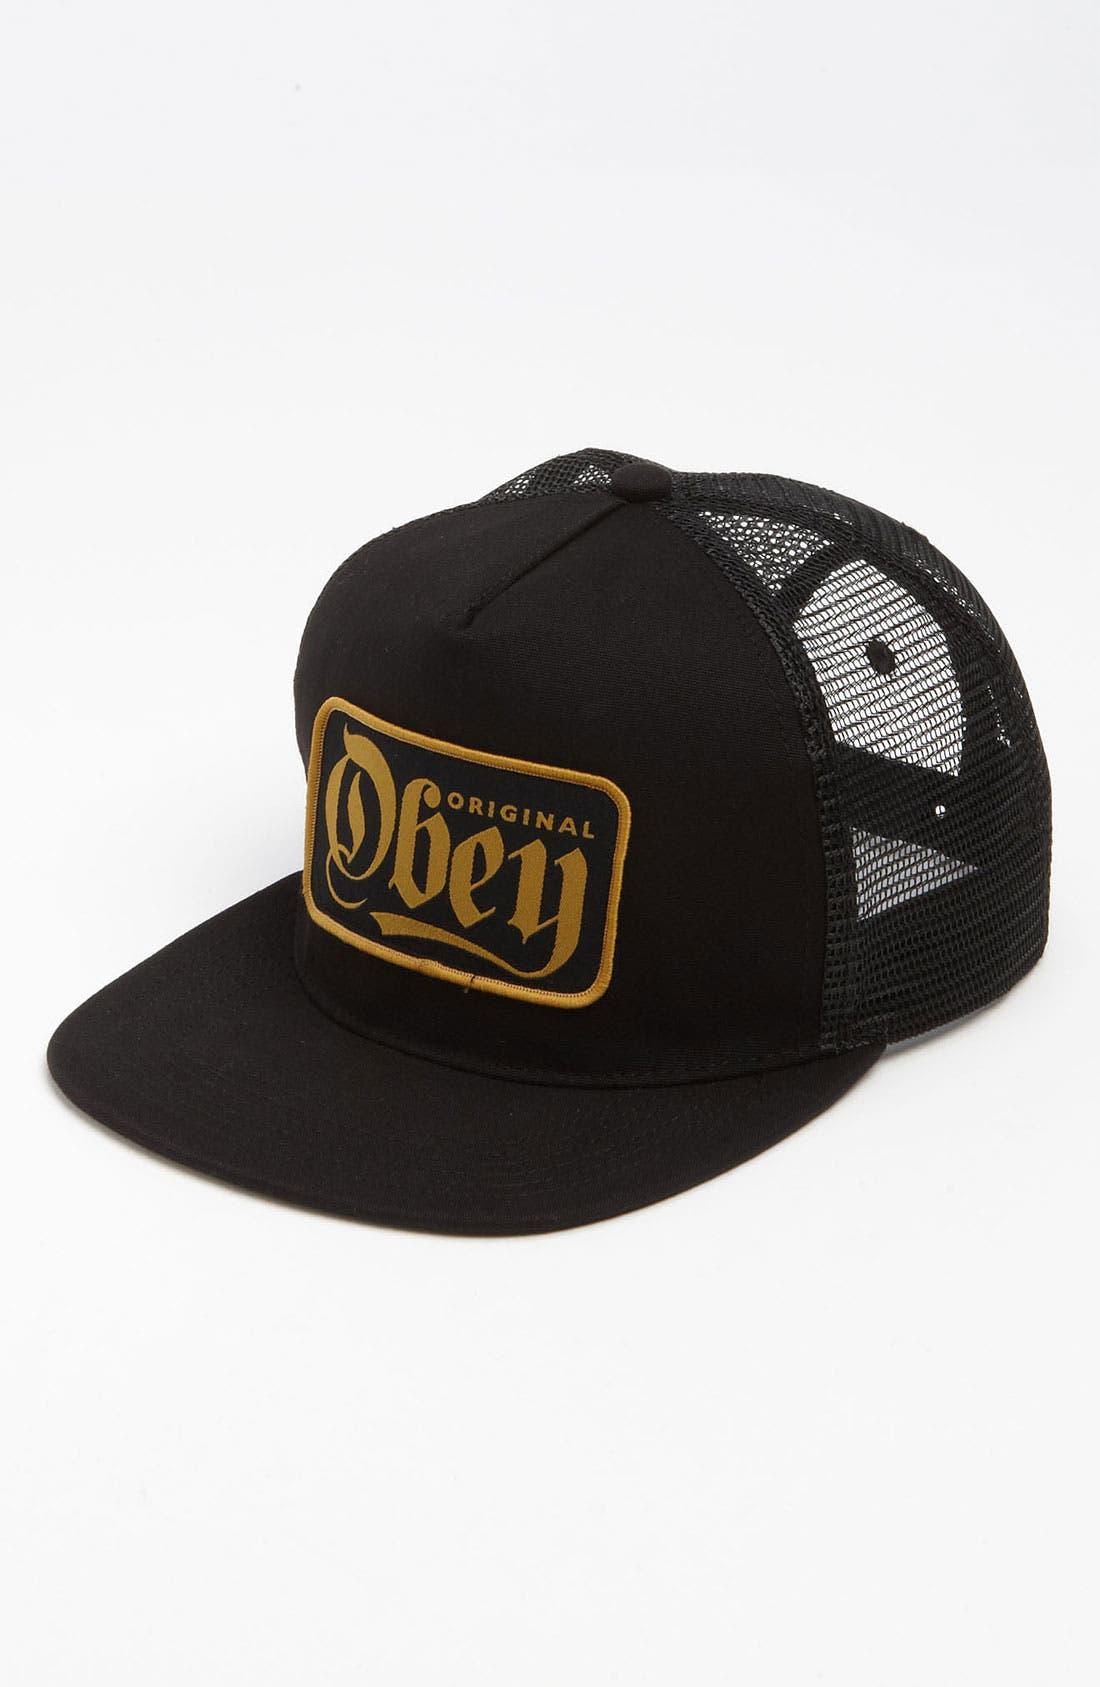 'Stout' Snapback Trucker Hat,                             Main thumbnail 1, color,                             Black